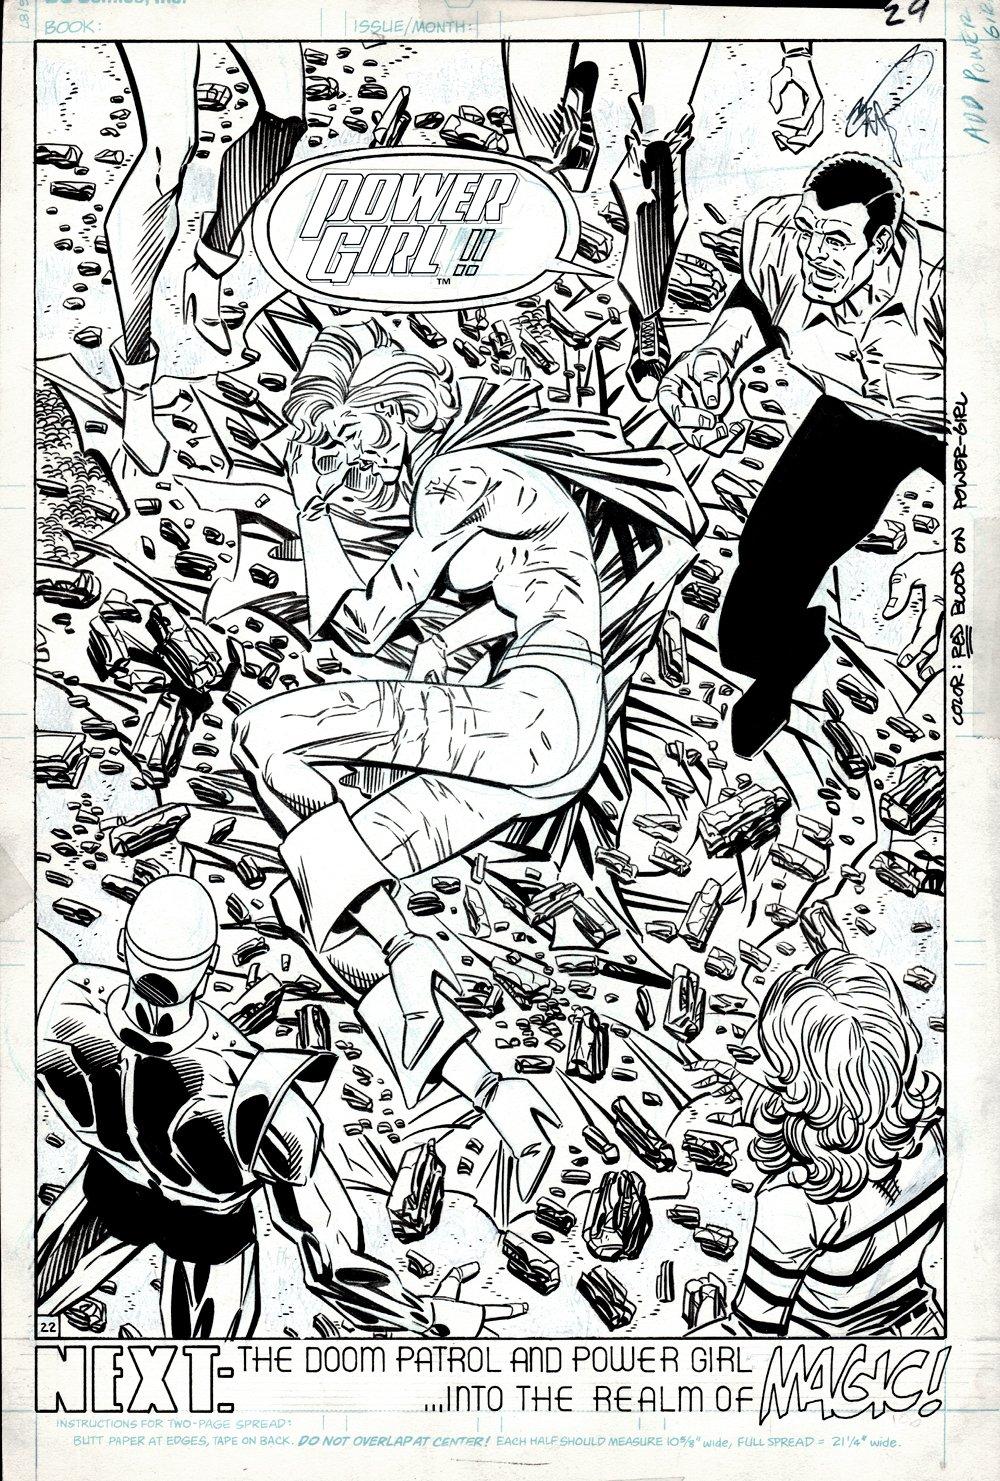 Doom Patrol #13 Last Page SPLASH (POWERGIRL!) 1988